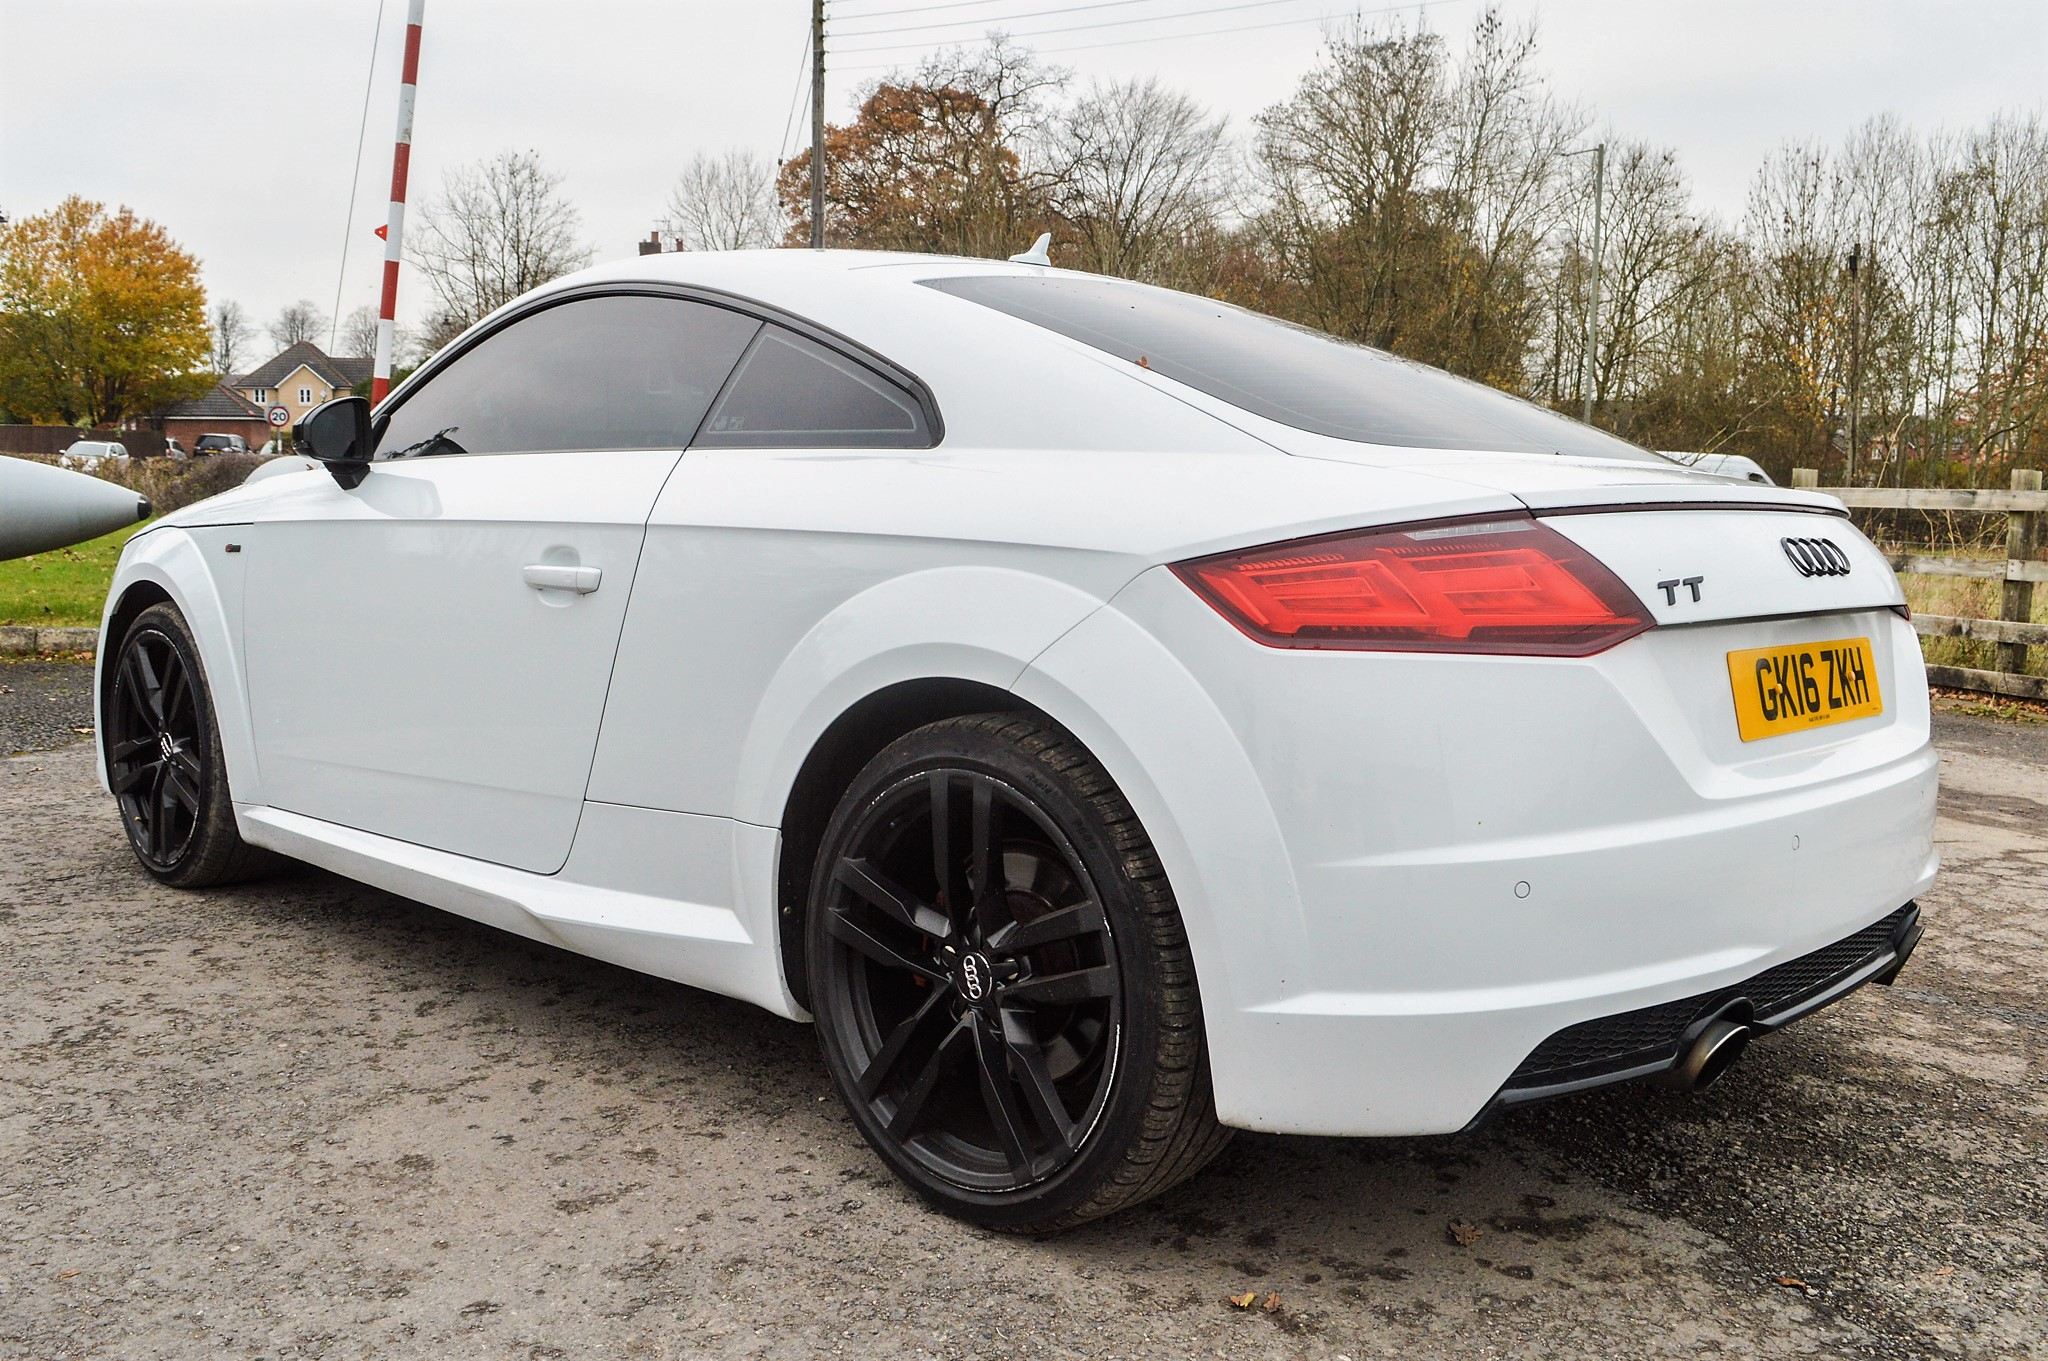 Lot 18A - Audi TT TFSi Quattro S-Line 2 litre petrol automatic coupe car Registration Number: GK16 ZKH Date of